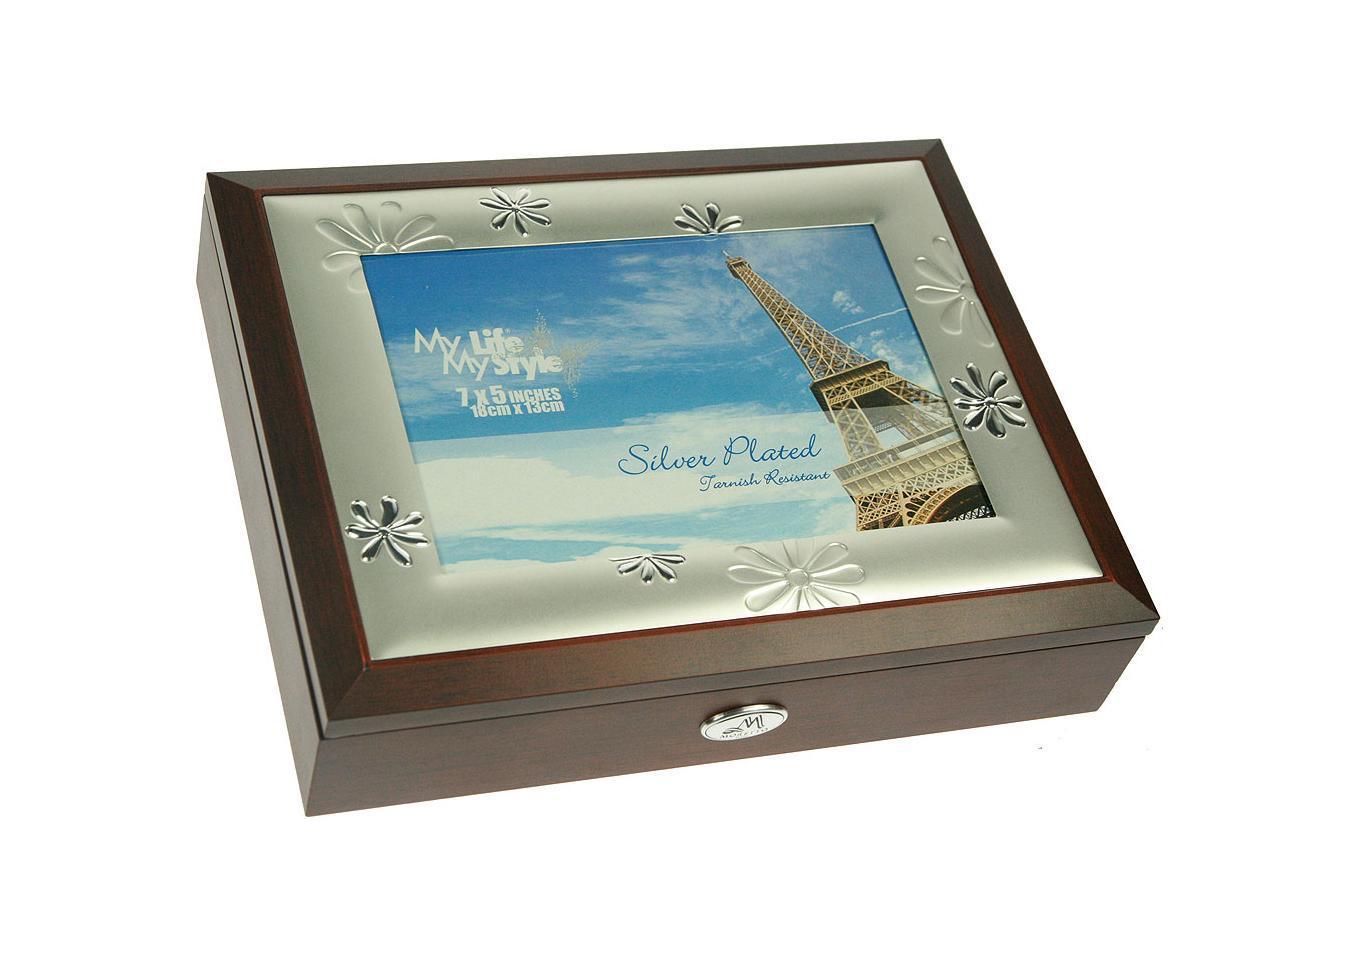 Шкатулка-фоторамка ювелирная Moretto, 24 х 19 х 5 см 139555 шкатулка русские подарки шкатулка